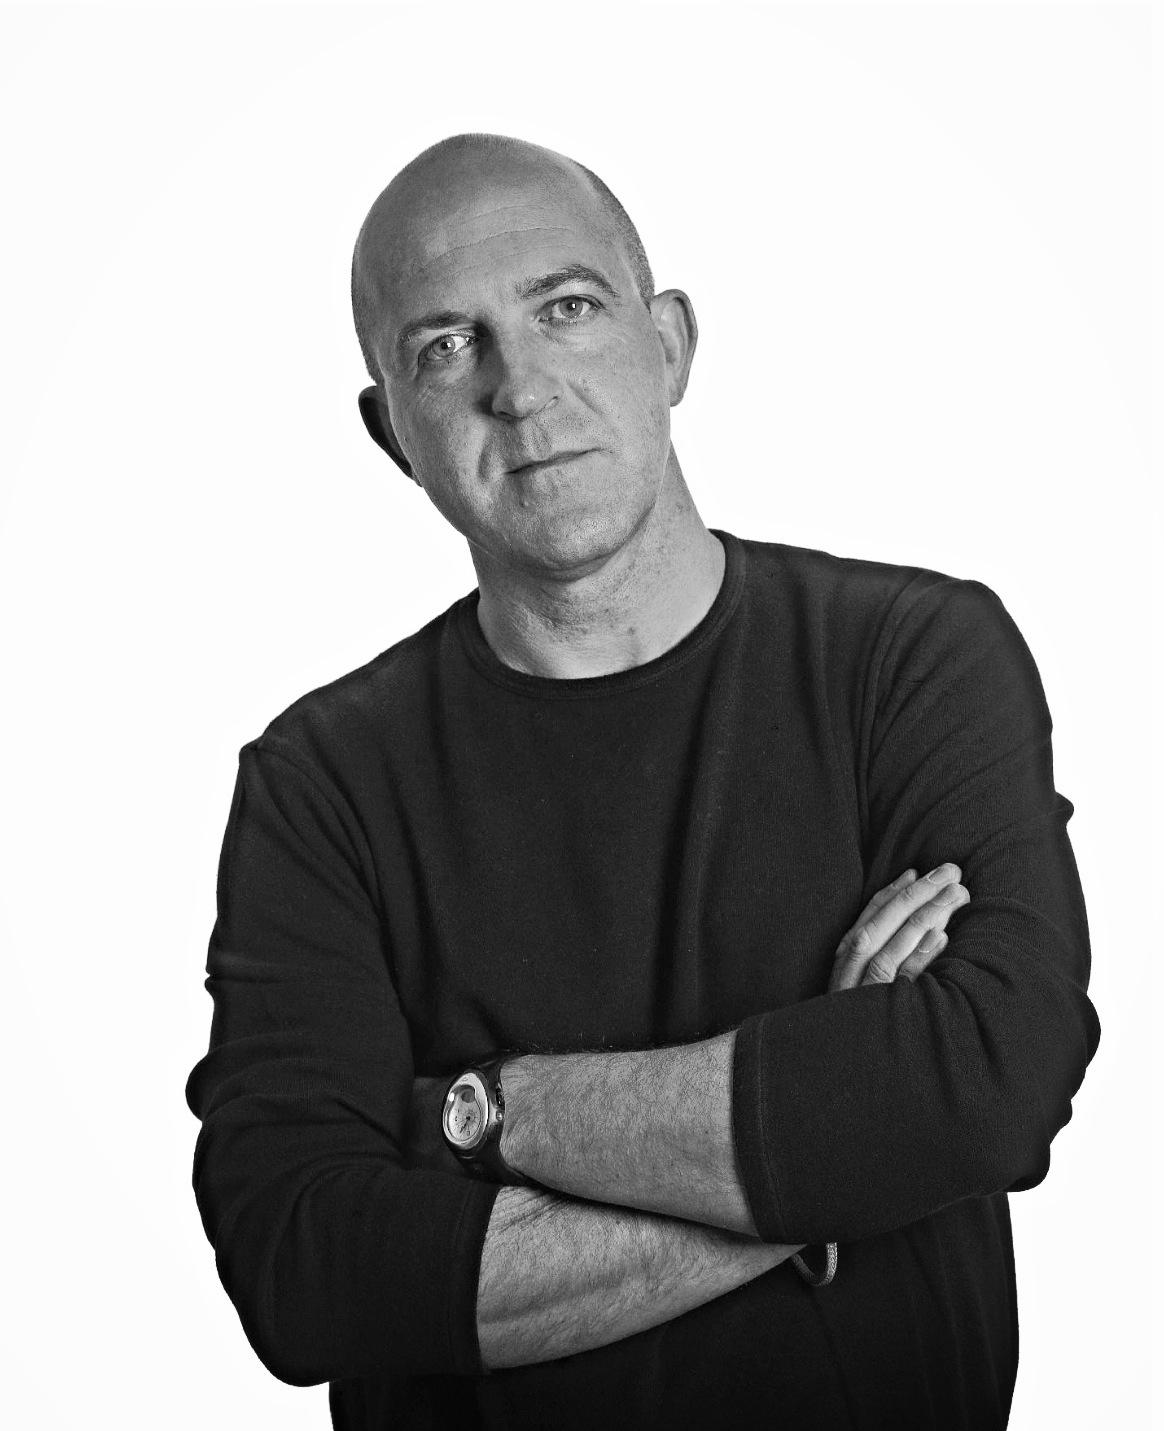 CHRIS SMITH - Barbershop Founder